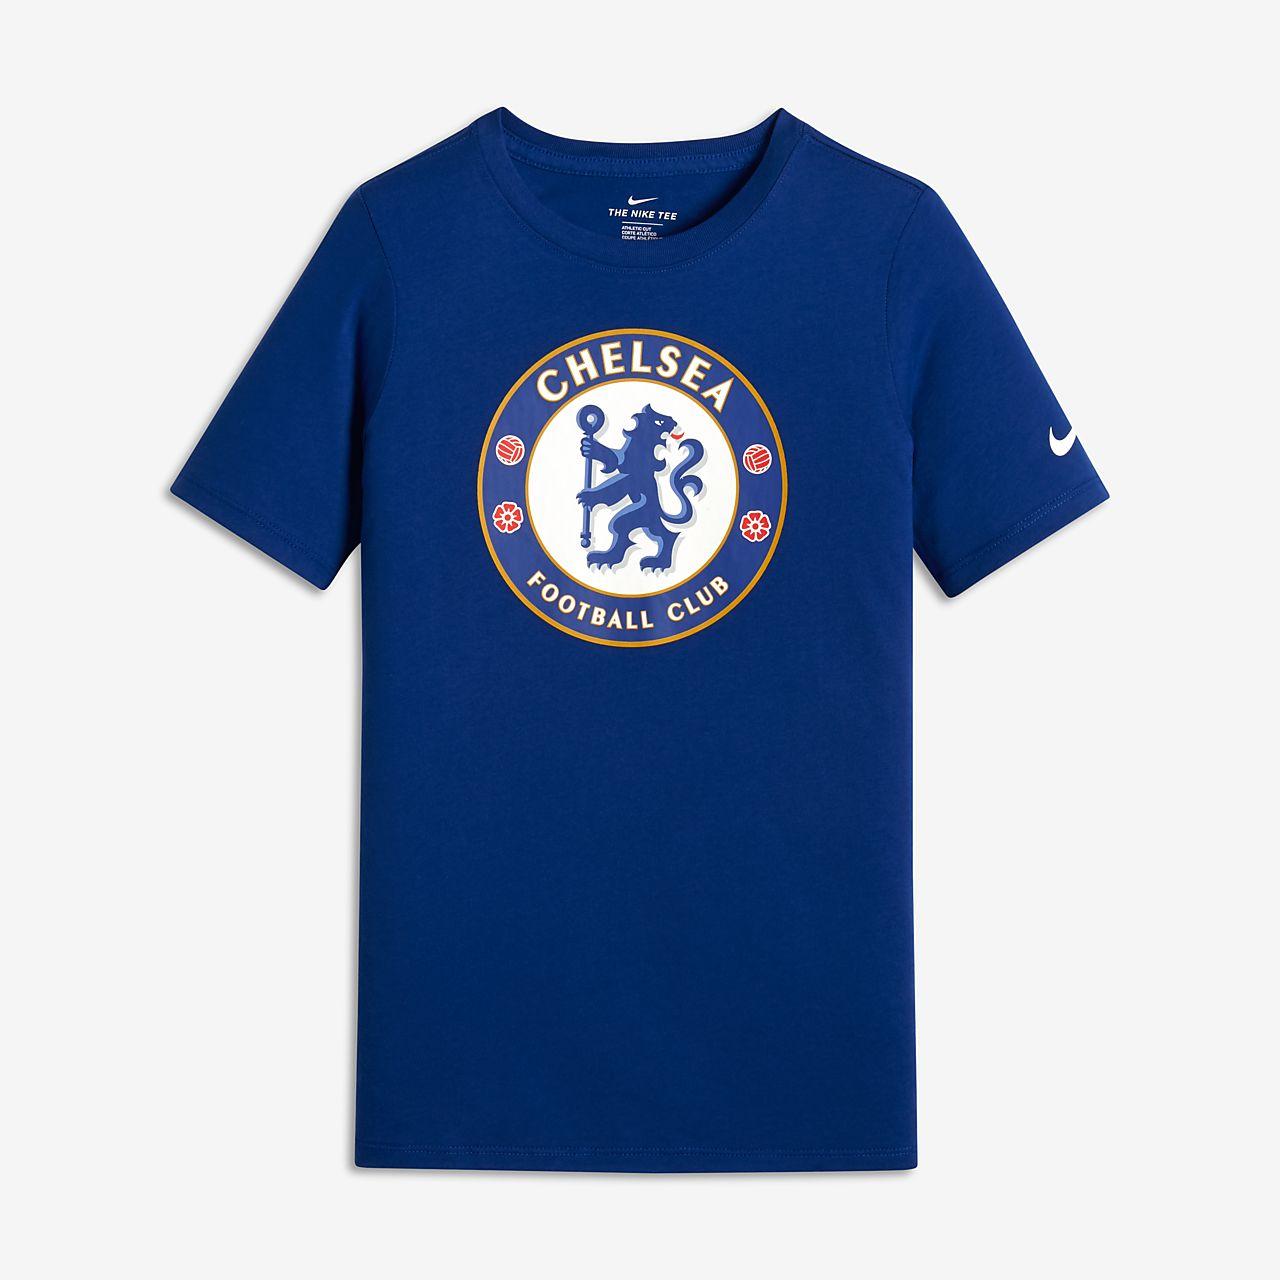 192e8d2496 Chelsea FC Evergreen Crest Camiseta - Niño a y niño a pequeño a ...